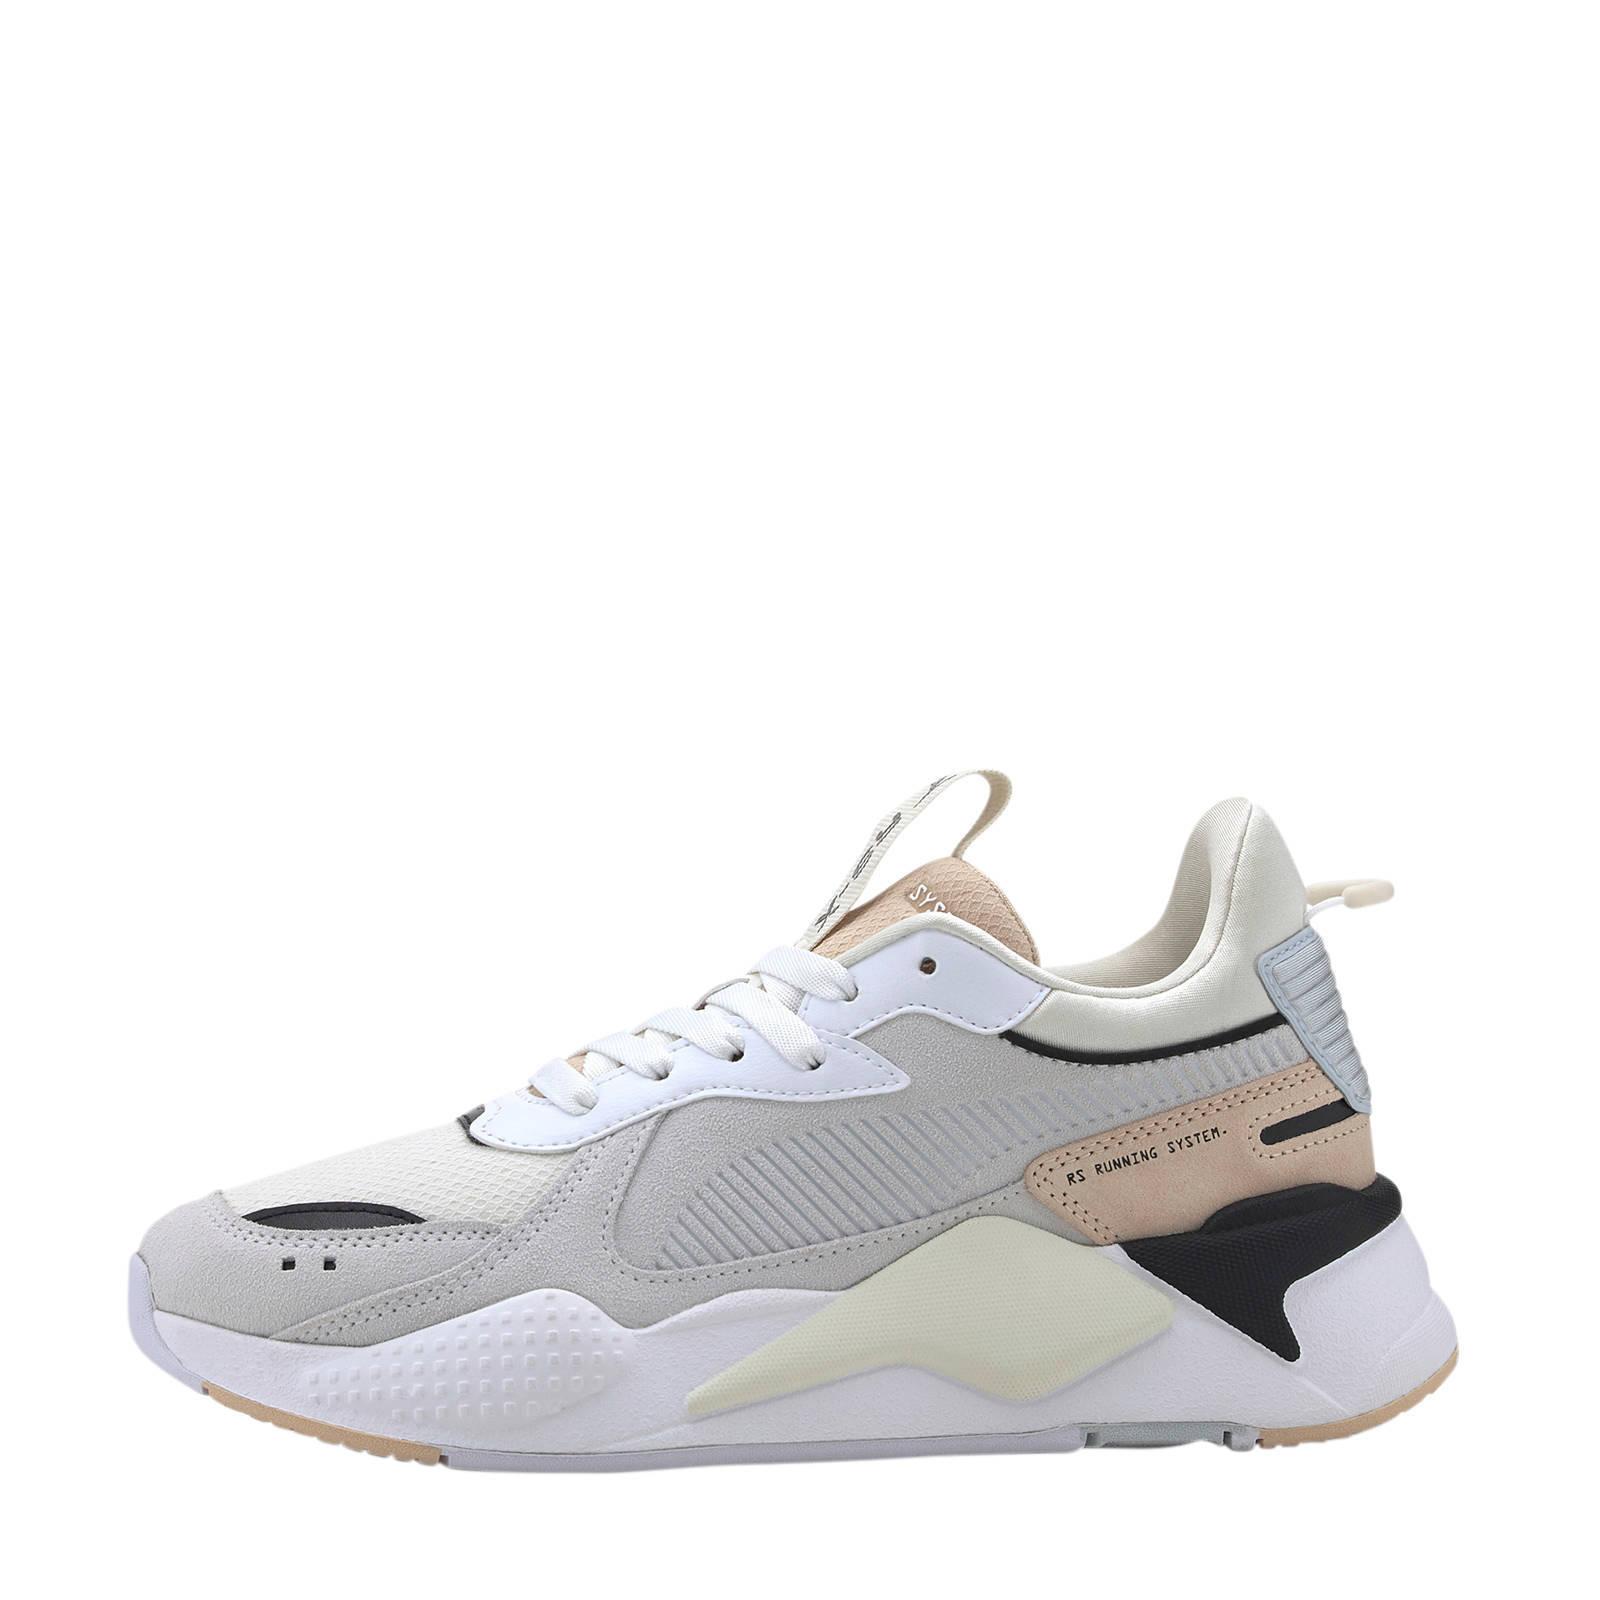 Puma RS-X Reinvent suède sneakers wit/beige | wehkamp